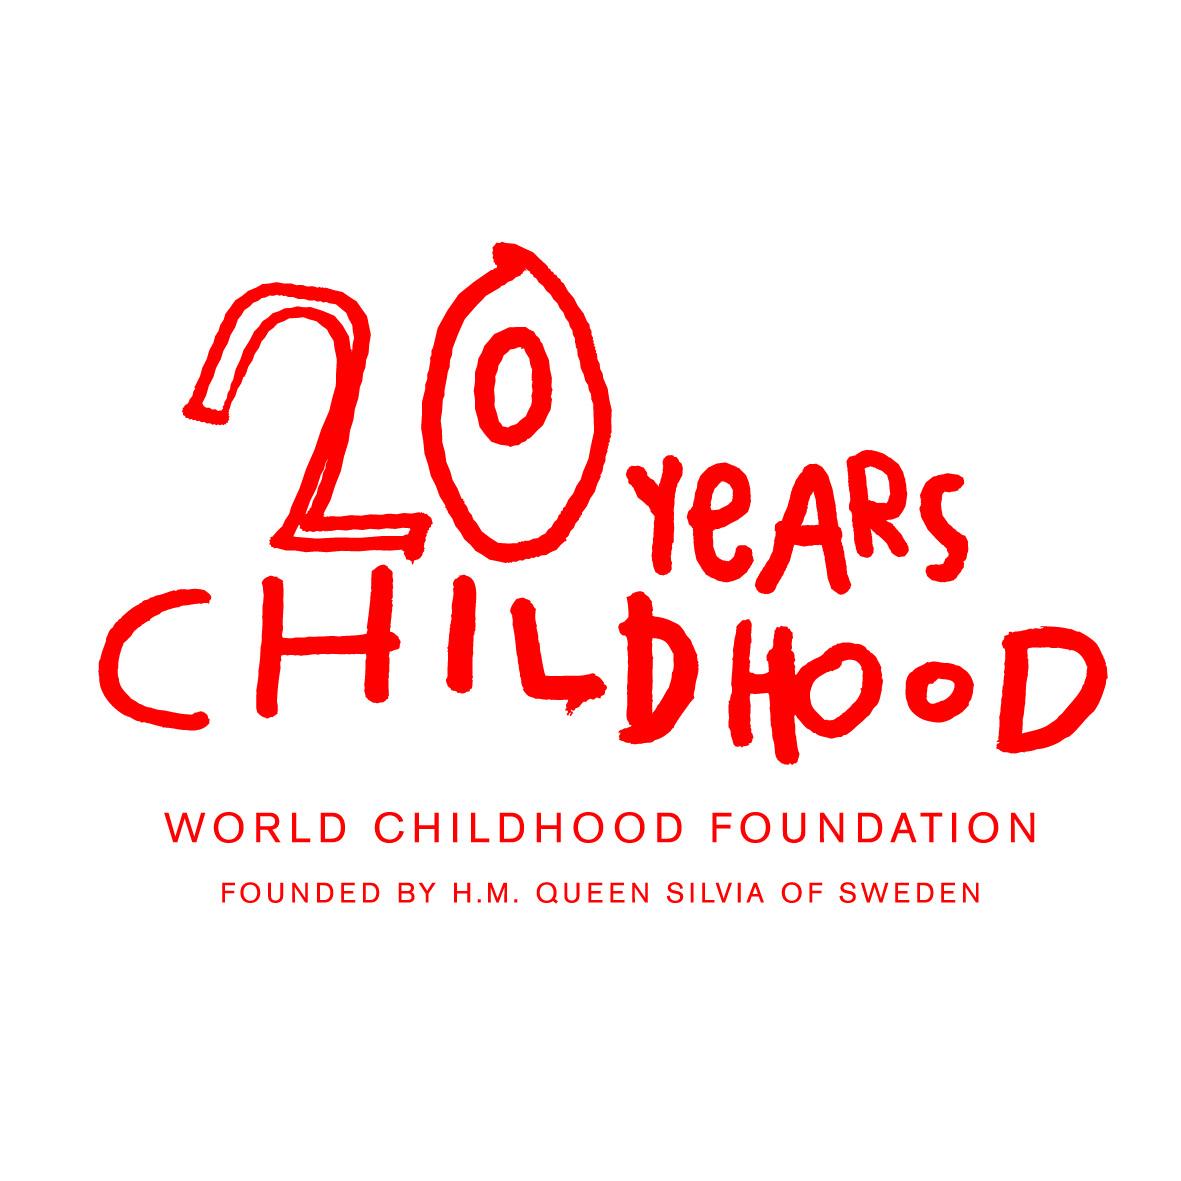 Childhood20_ENG_RED.jpg